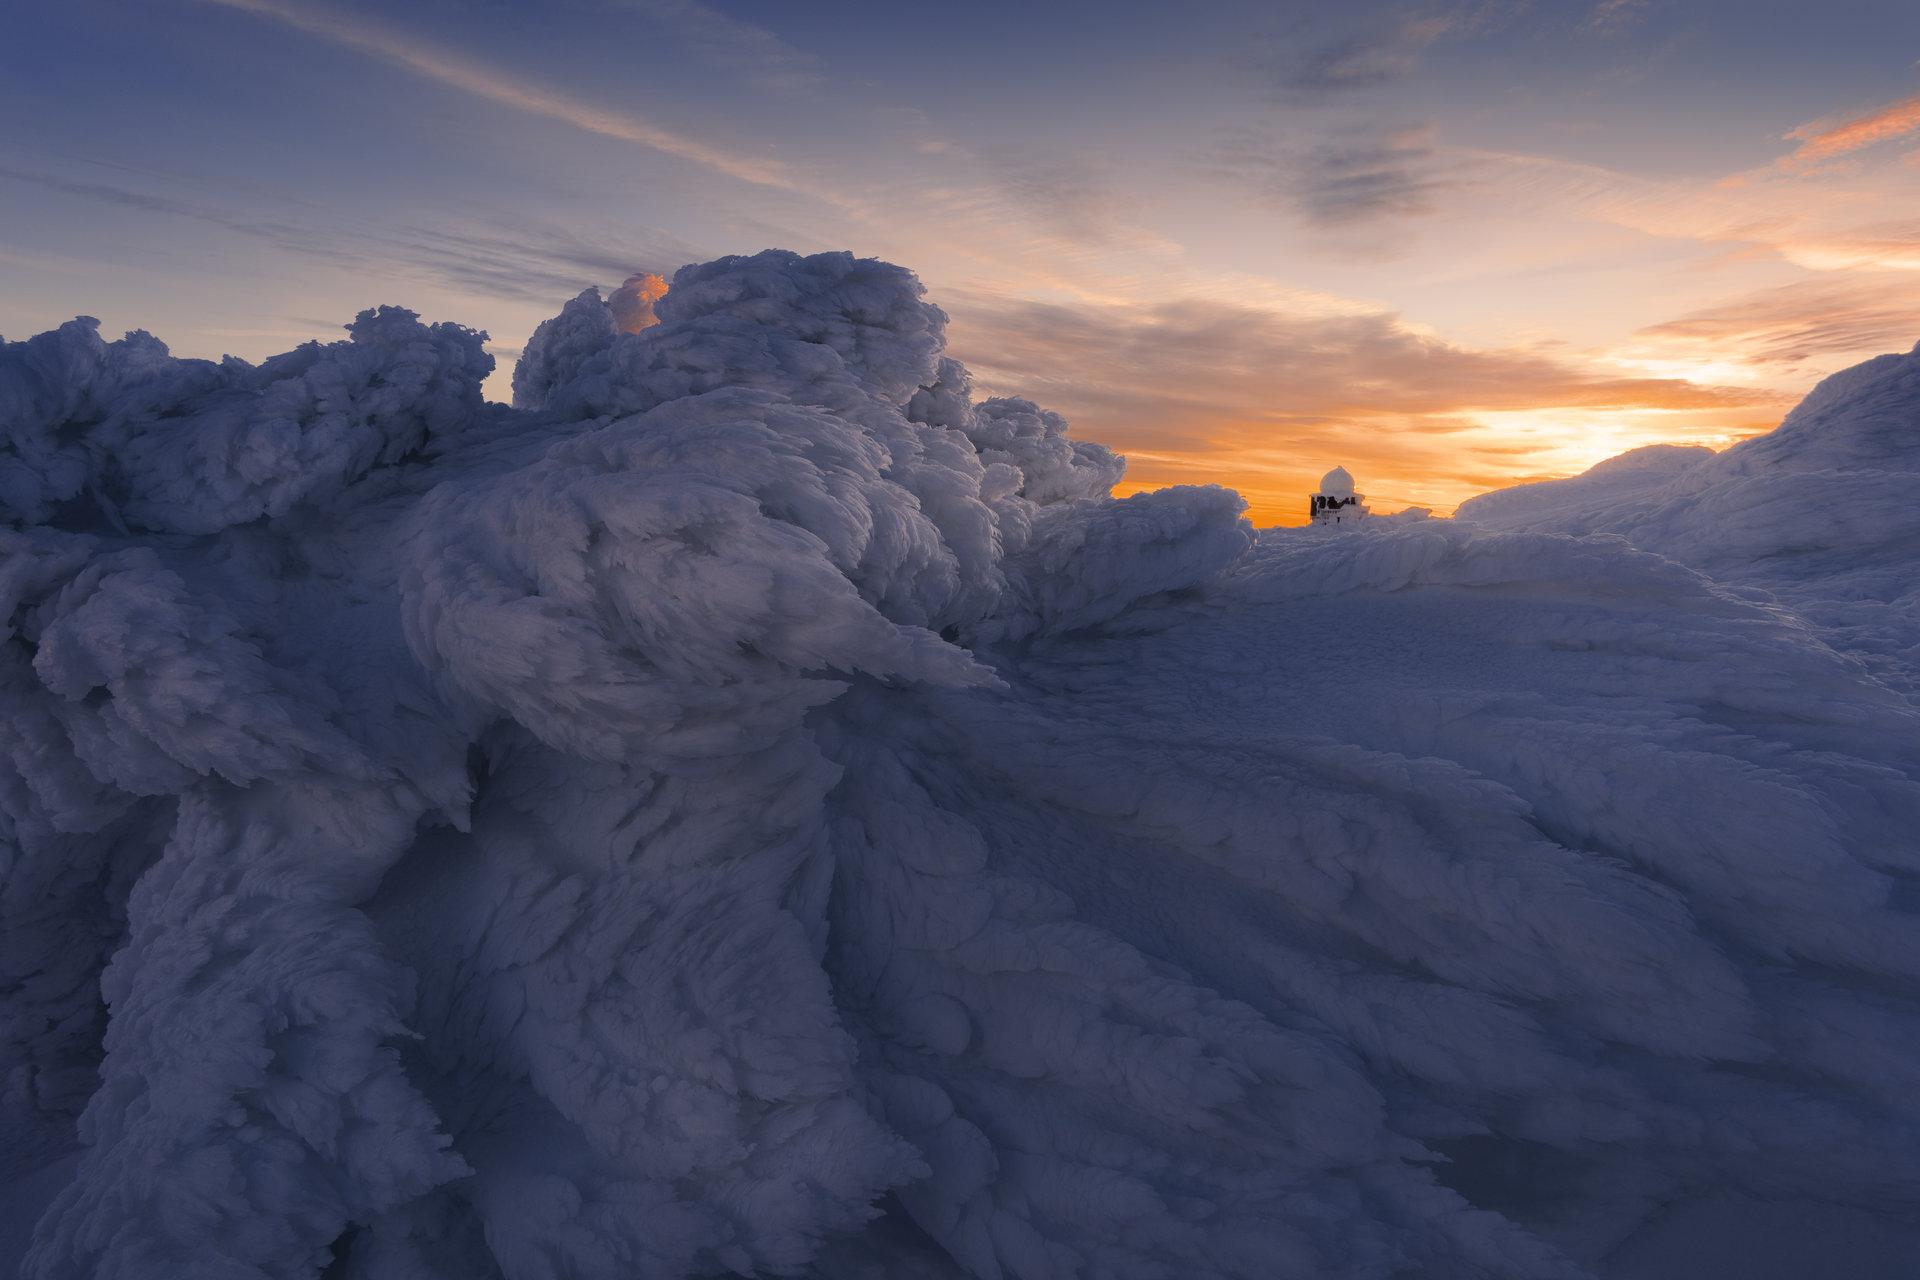 В замръзналото кралство на Витоша..   Author David Kirilov - Dido99   PHOTO FORUM